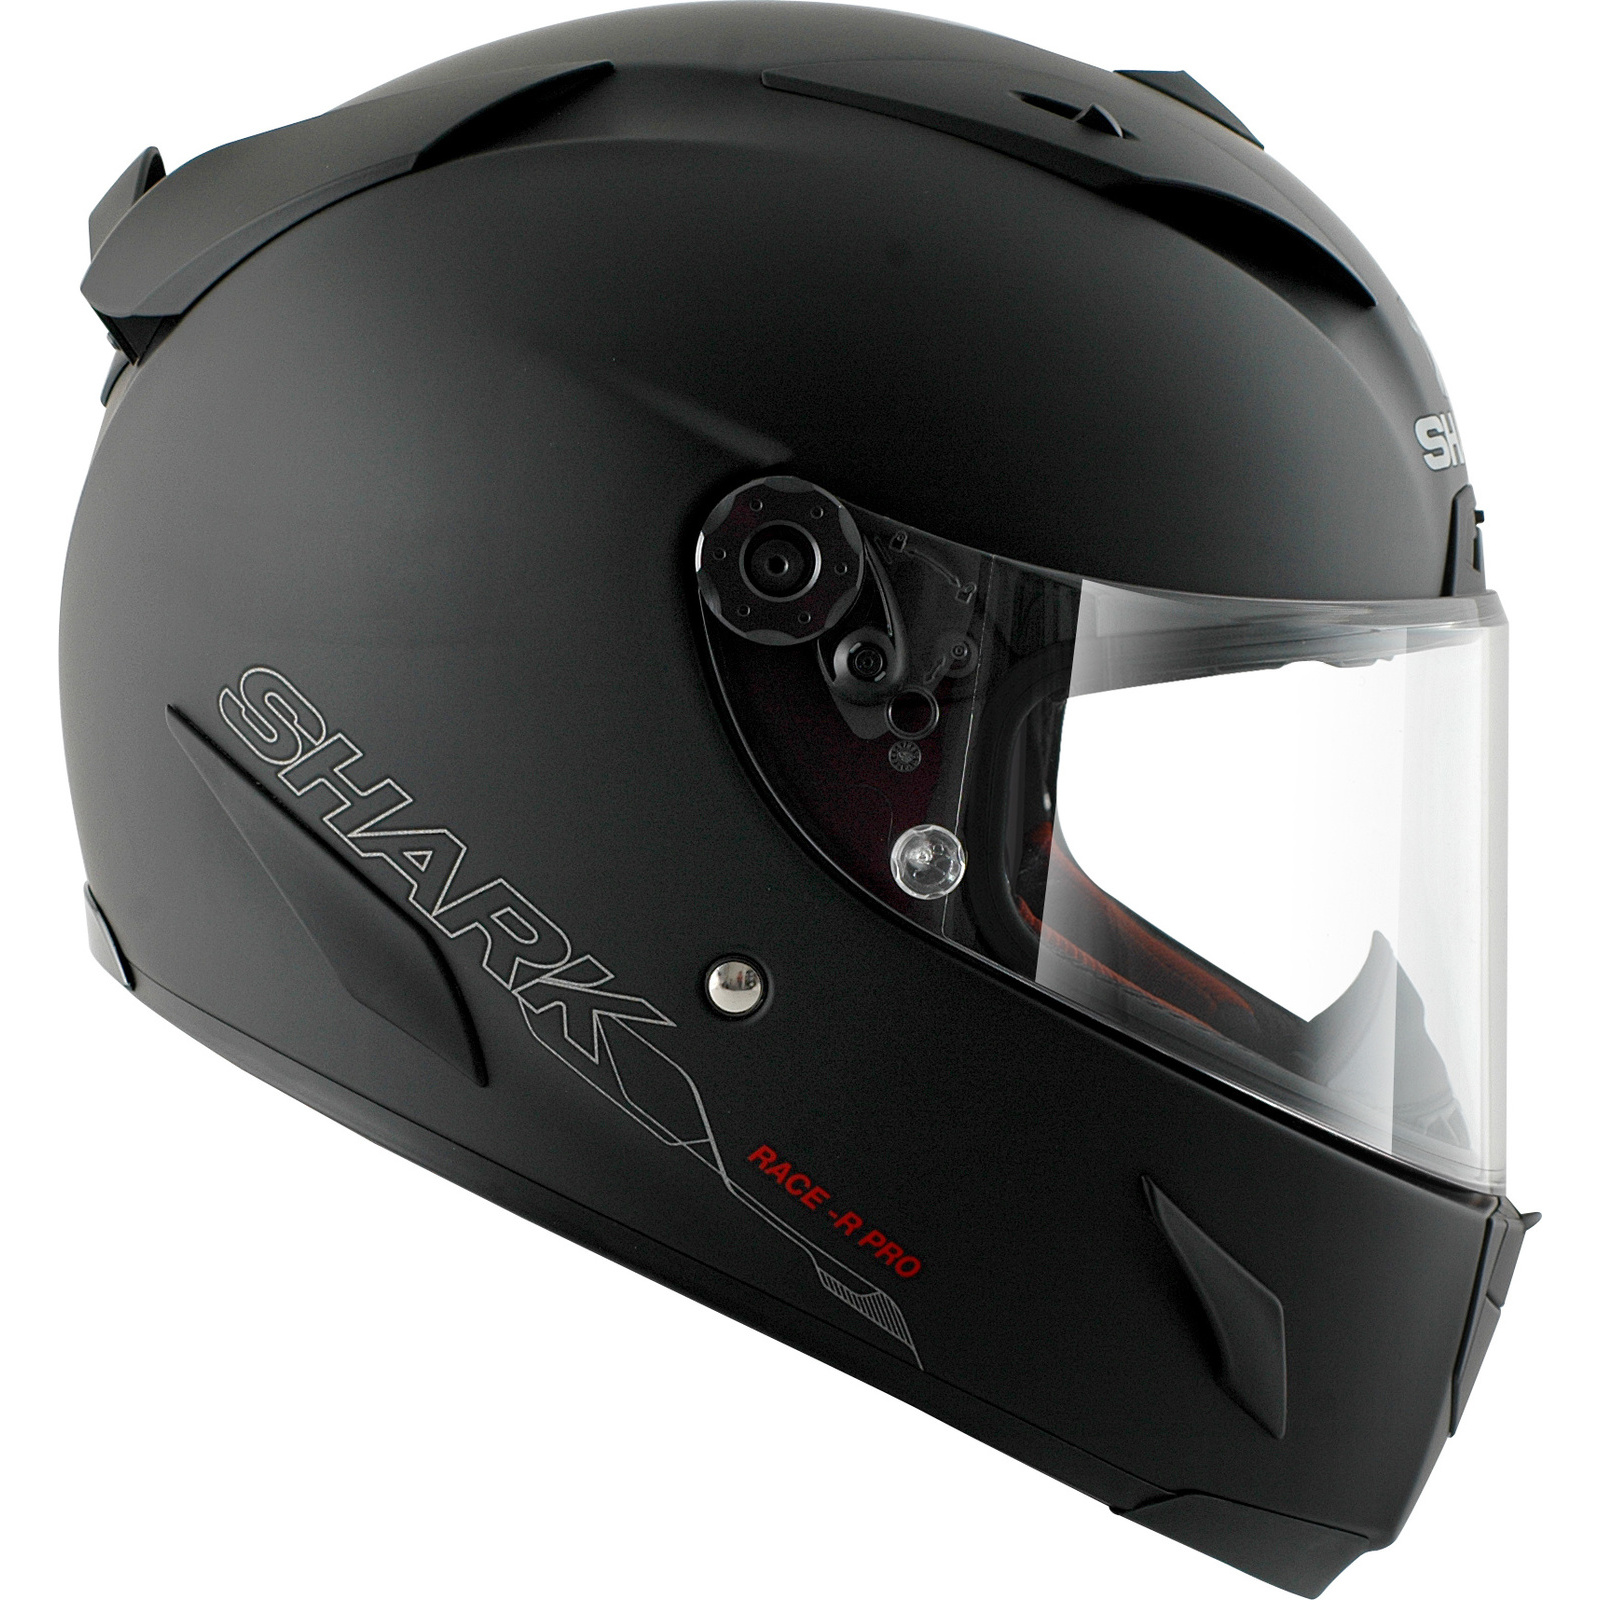 shark race r pro blank full face carbon fibre sharp motorbike motorcycle helmet ebay. Black Bedroom Furniture Sets. Home Design Ideas